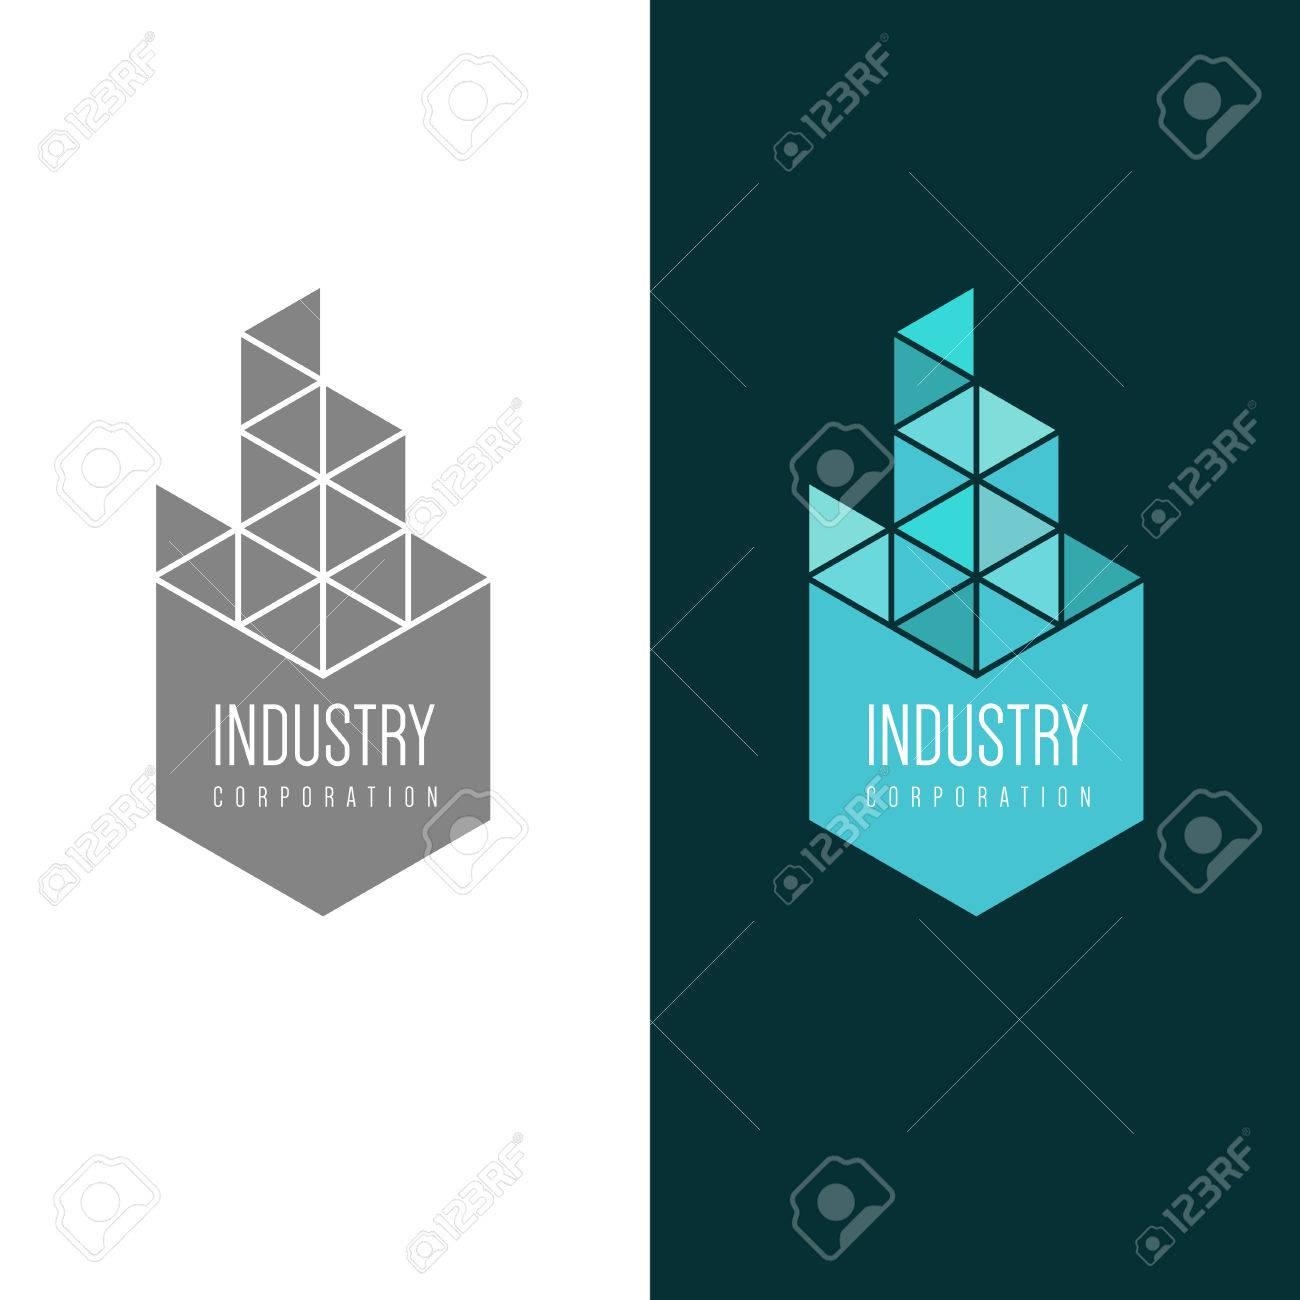 Logo Inspiration For Construction Companies, Real Estate Agencies ...